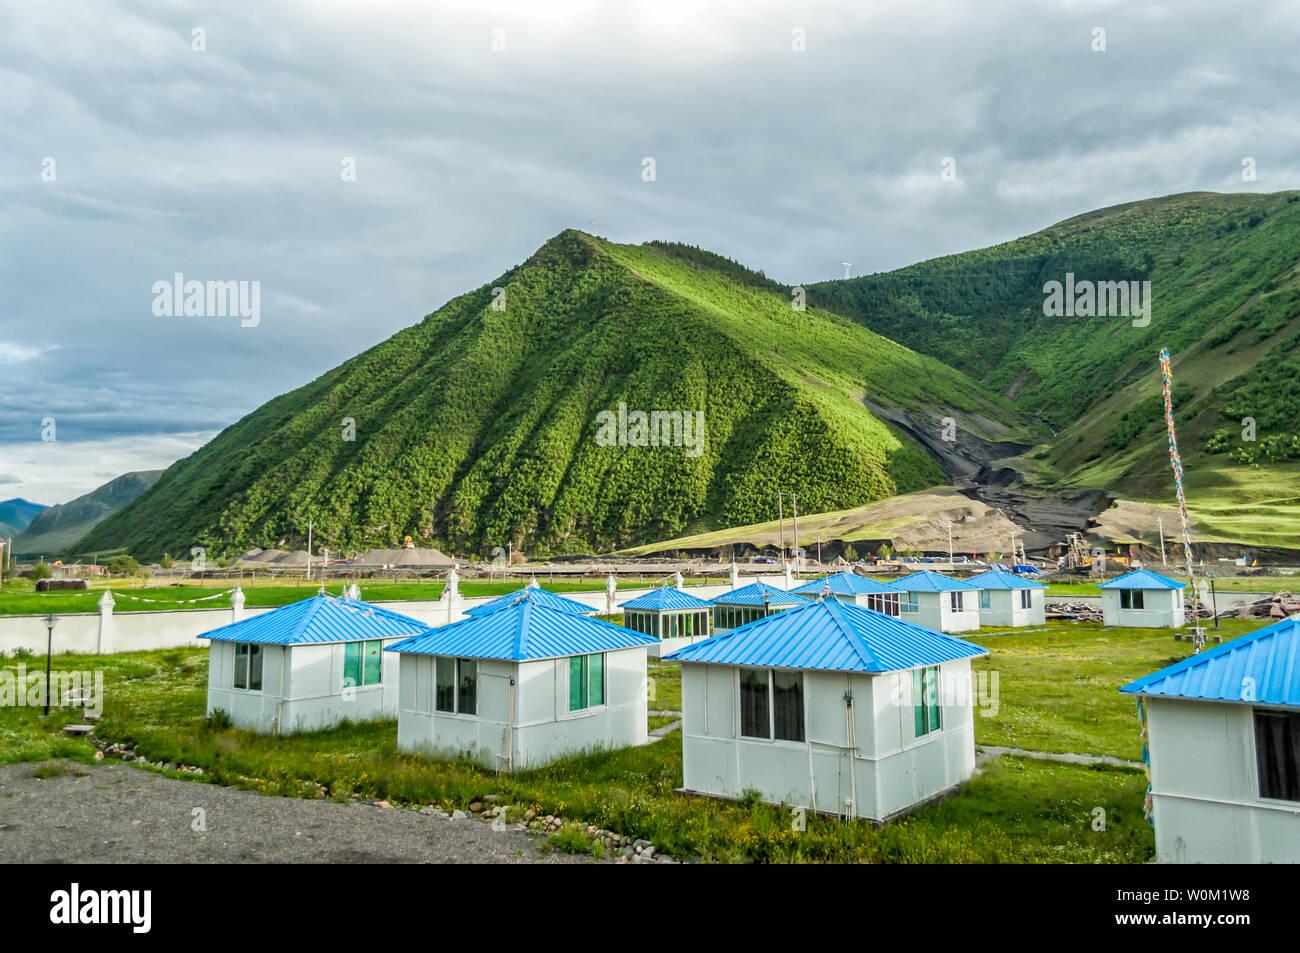 Paisajes naturales de puente Xindu Zona tibetana en Tagong, Sichuan Foto de stock